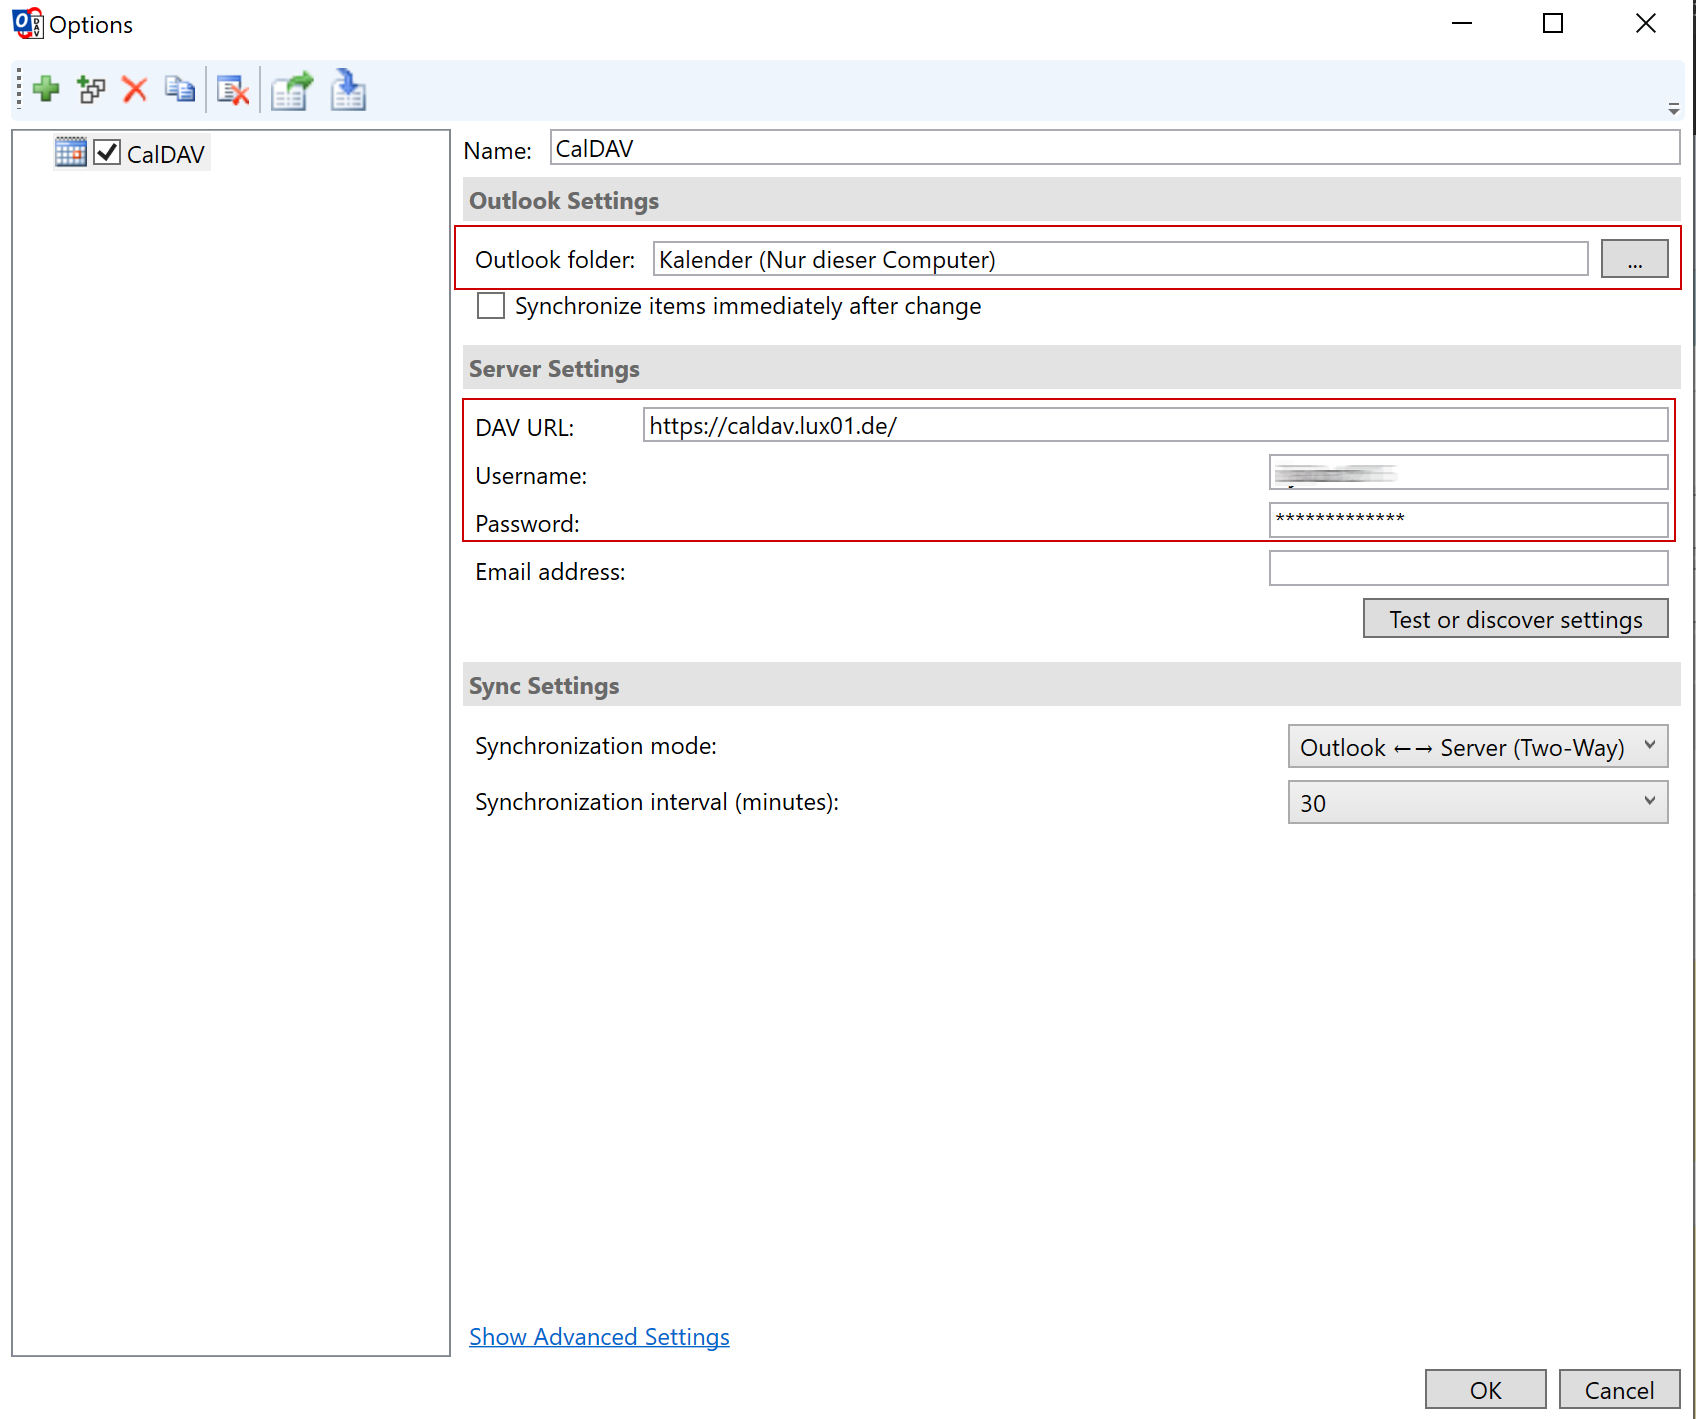 CalDAV via Outlook - 5